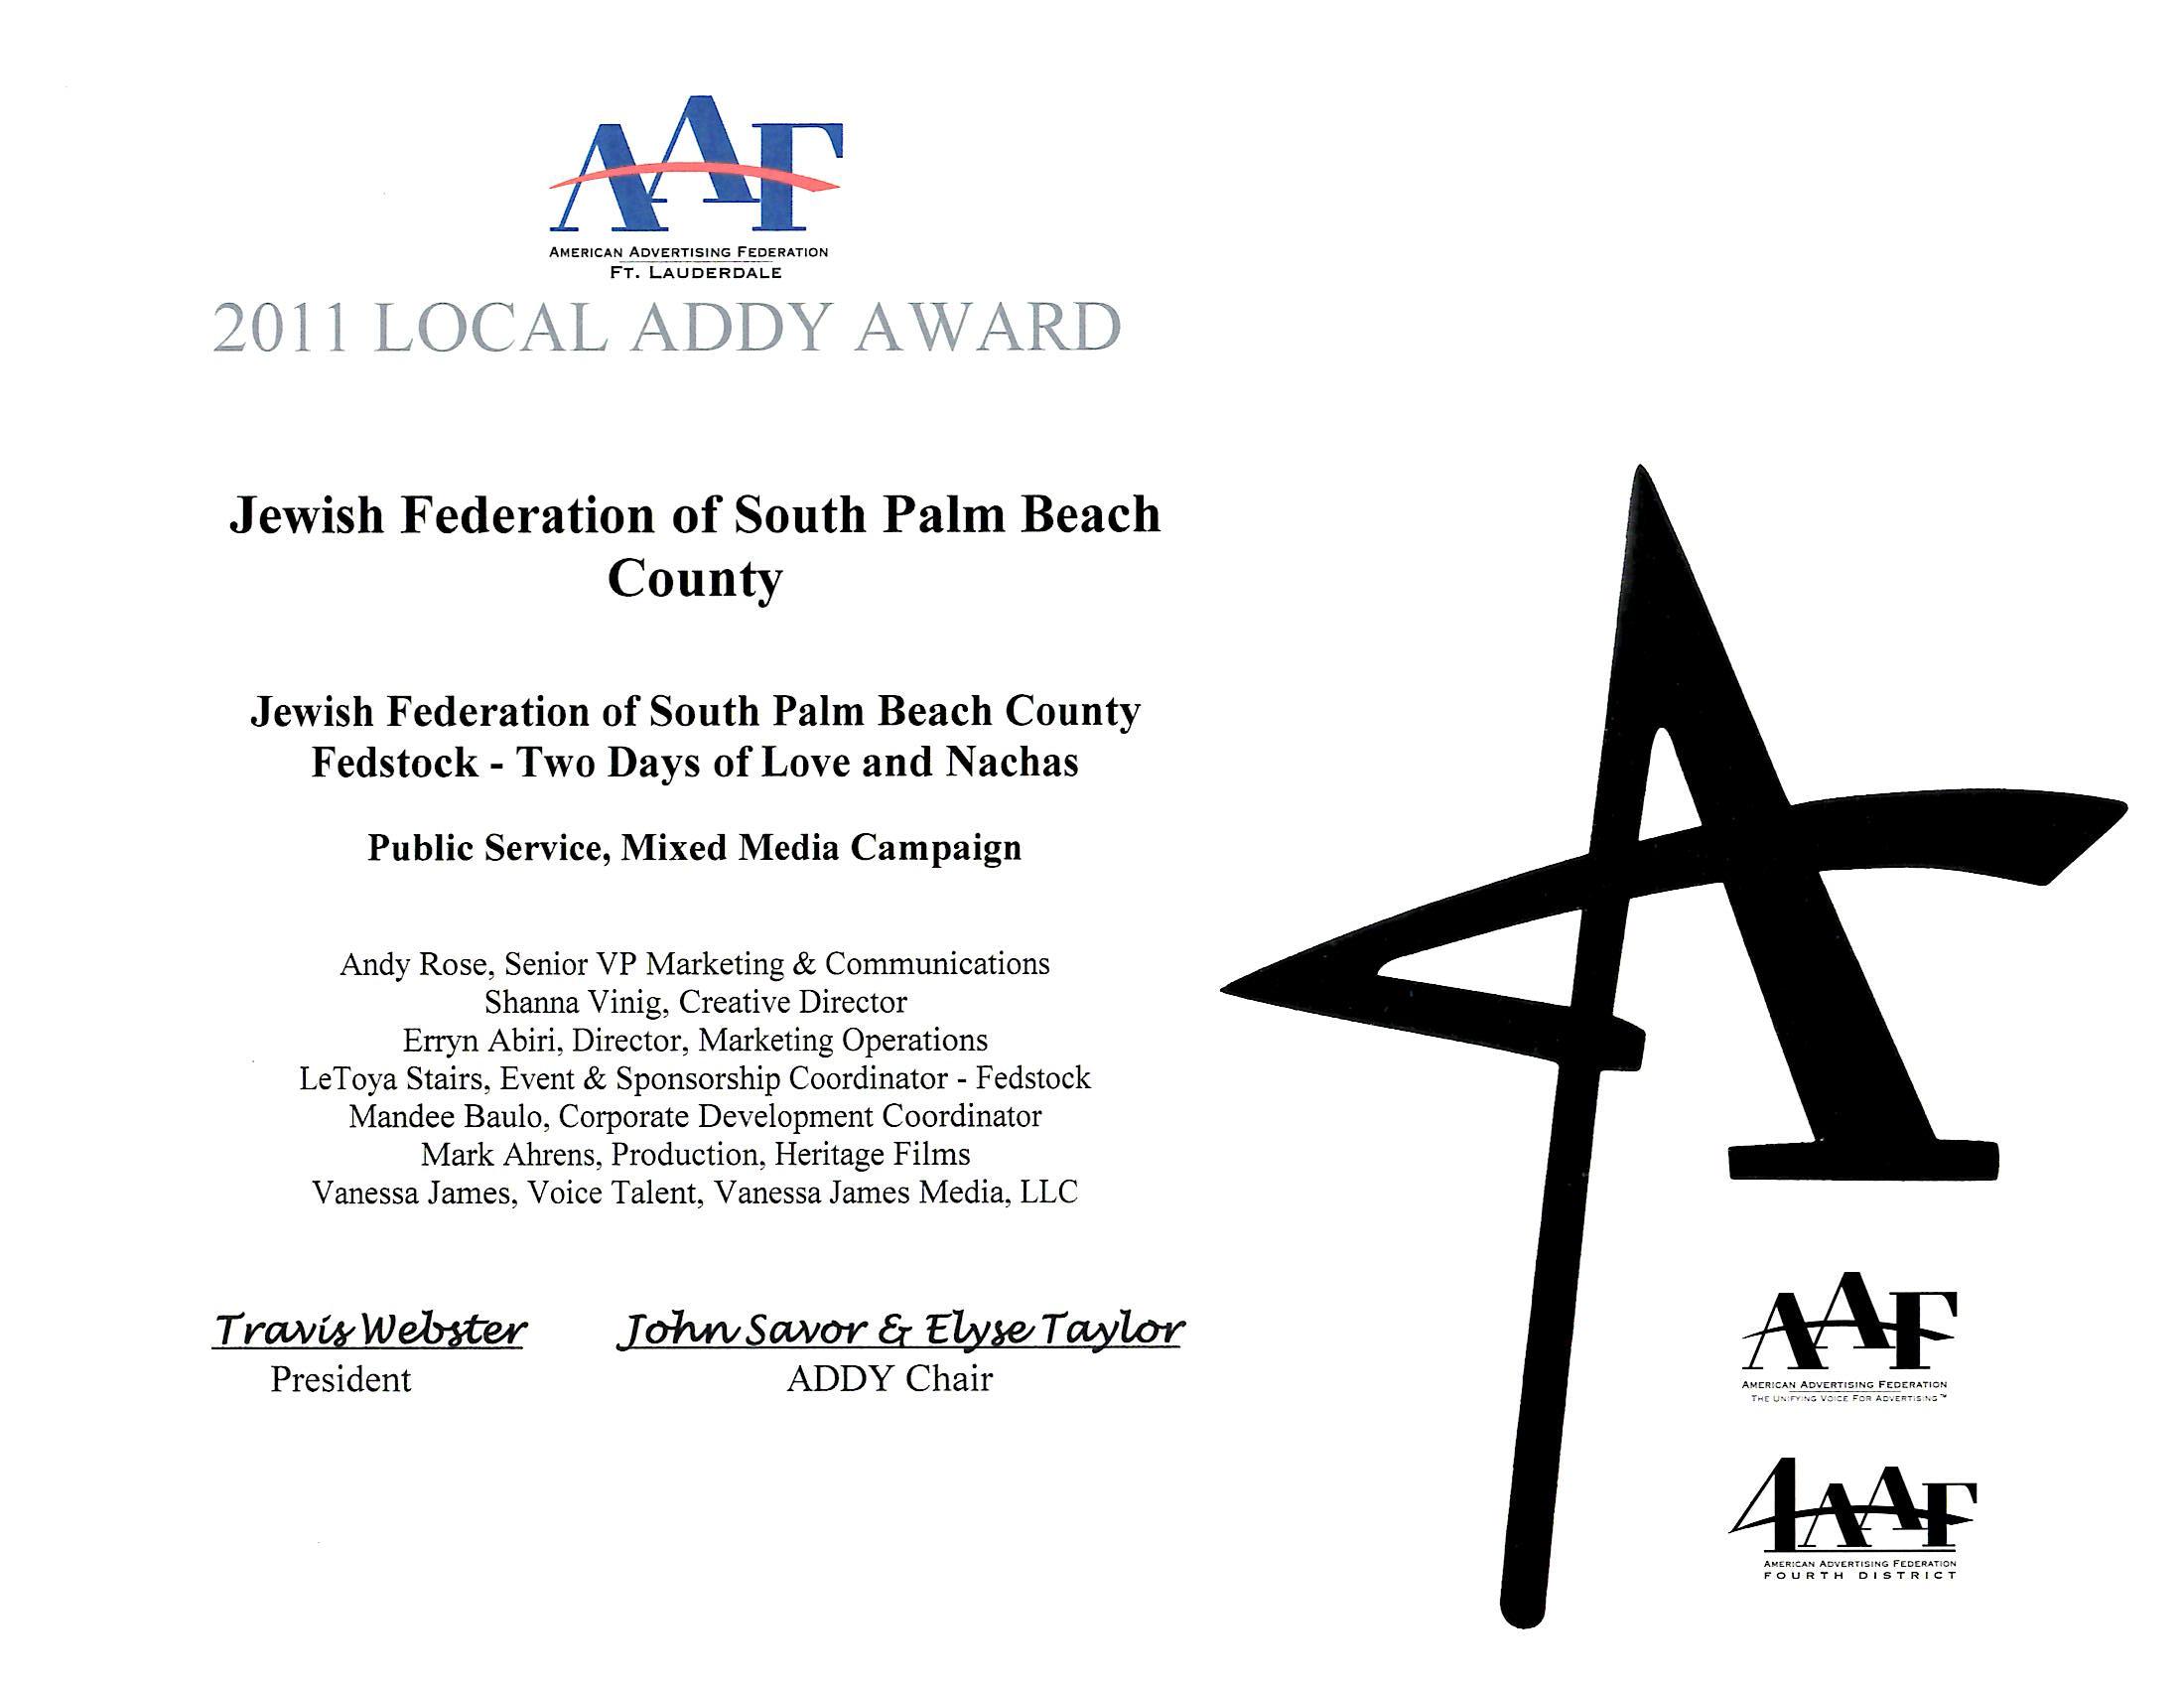 2011 Local Addy Award